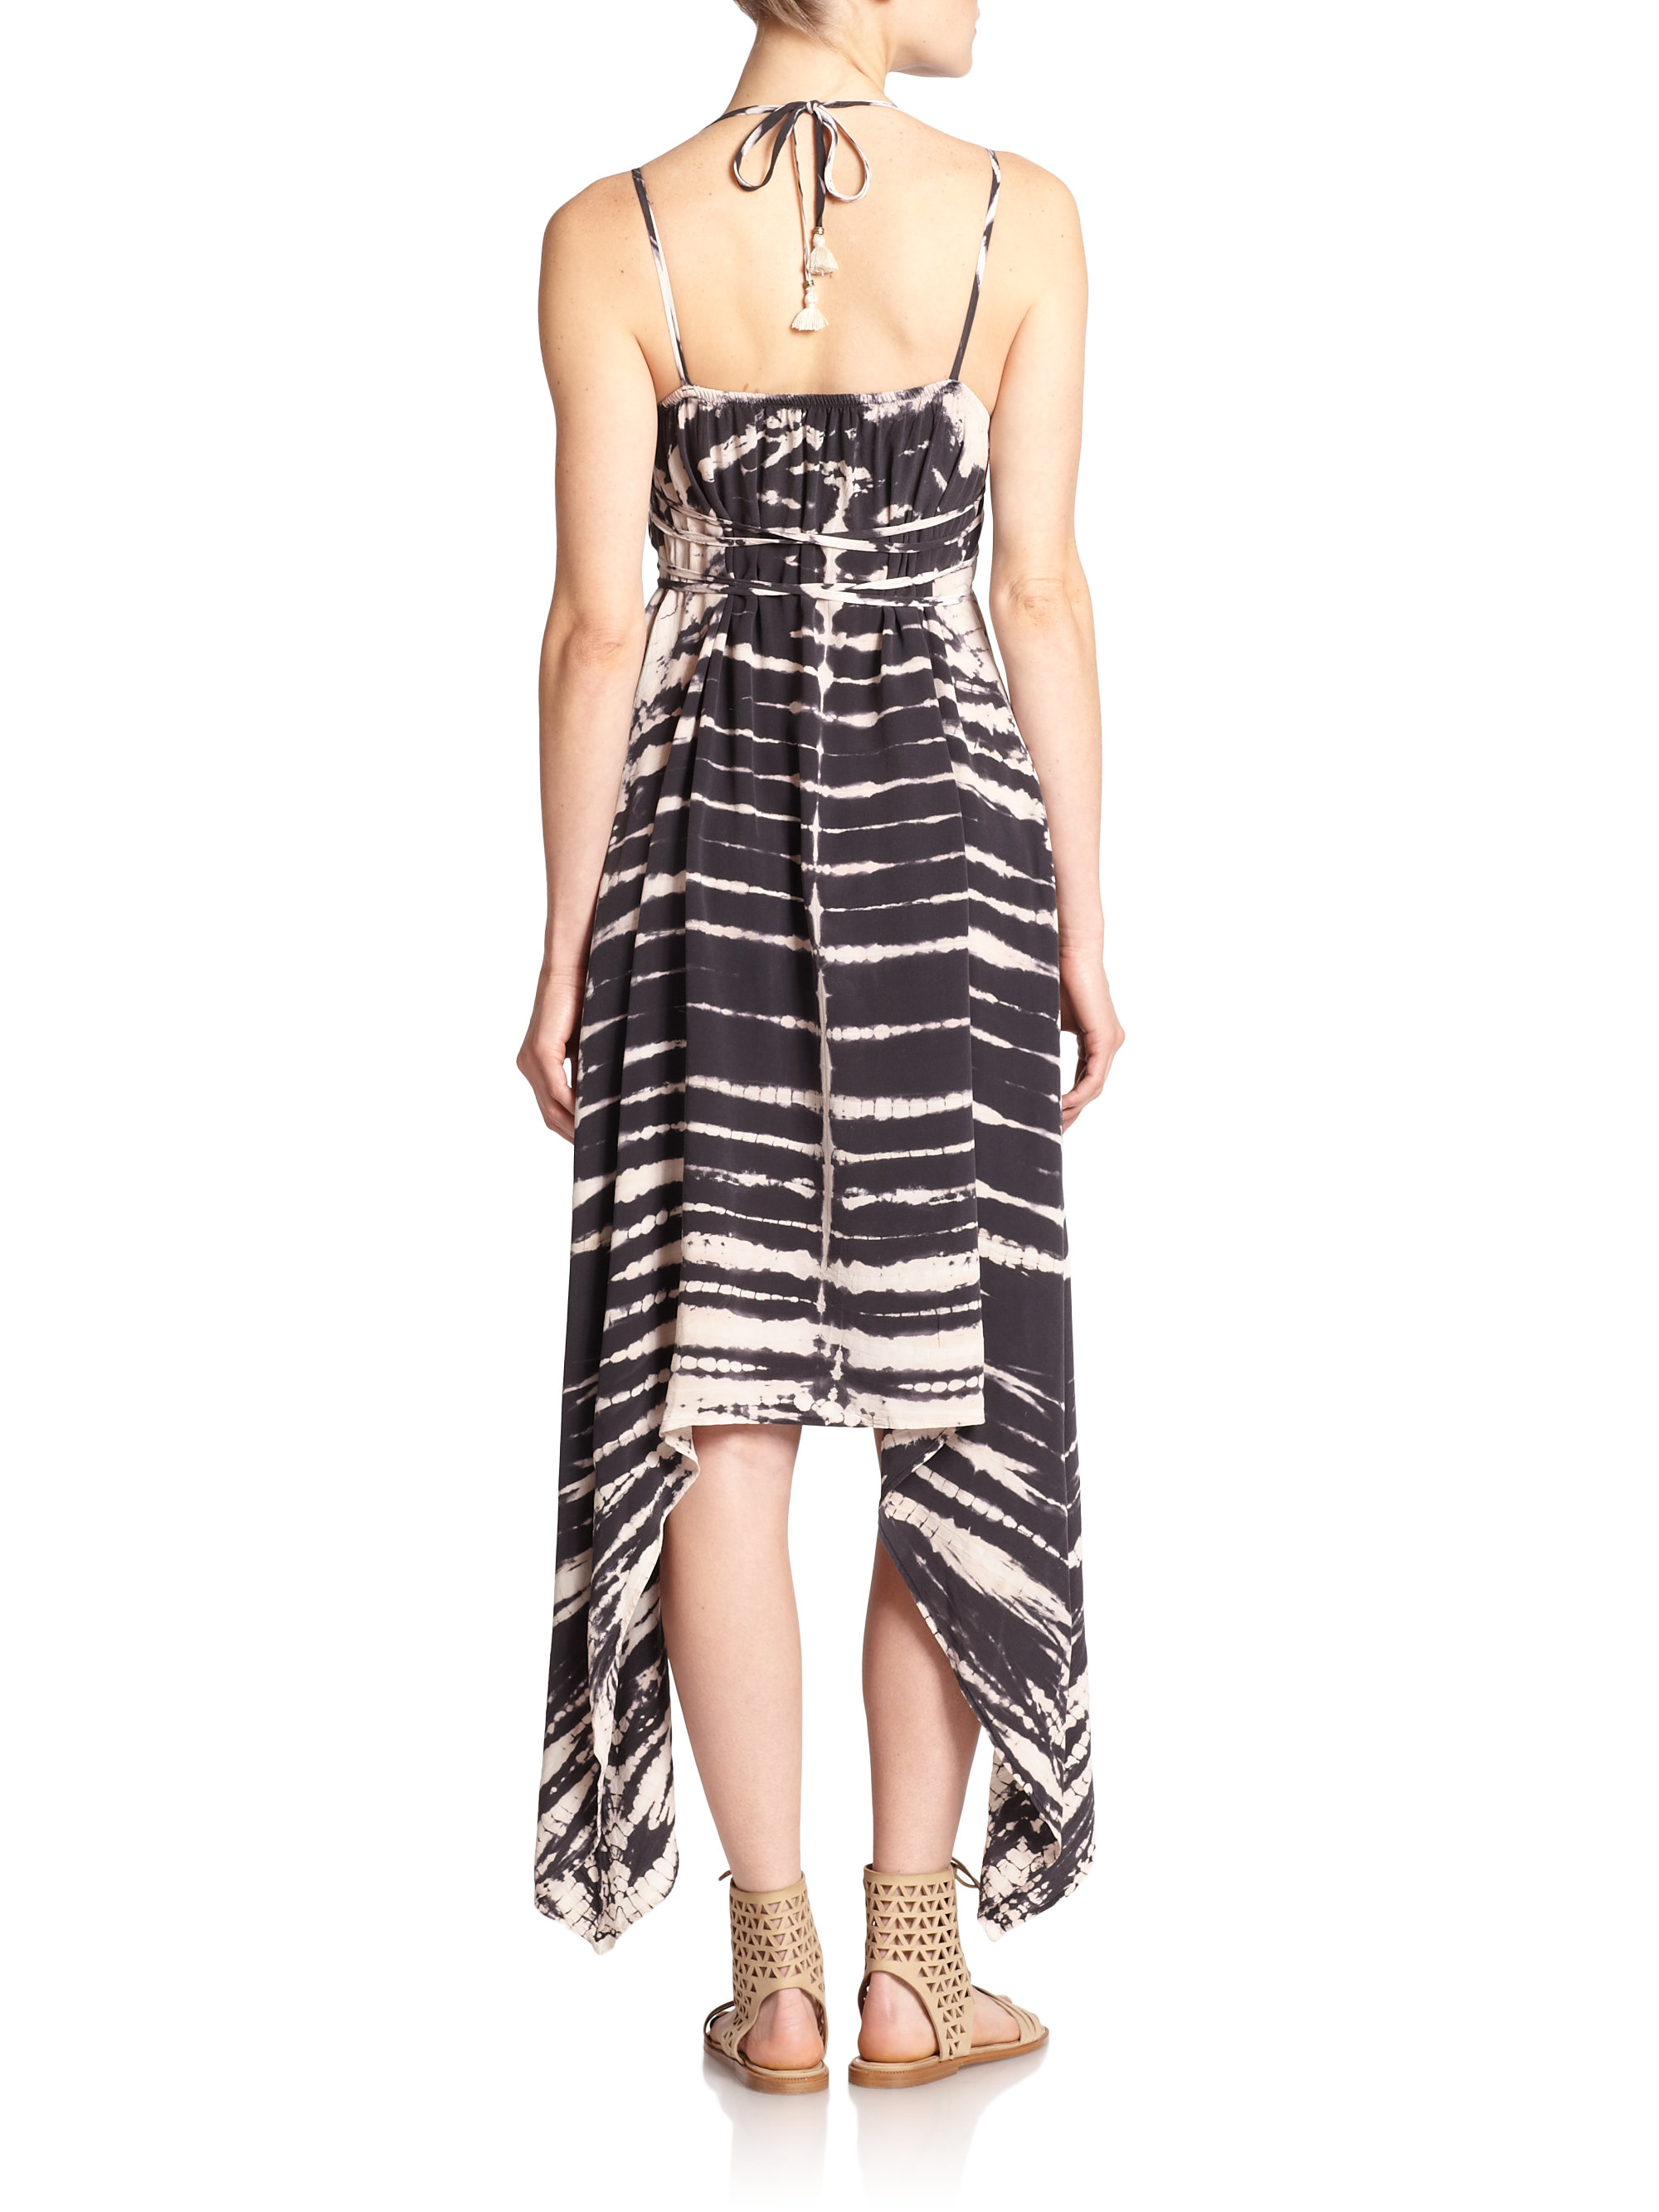 lyst gypsy 05 tie dye silk maxi dress in black. Black Bedroom Furniture Sets. Home Design Ideas